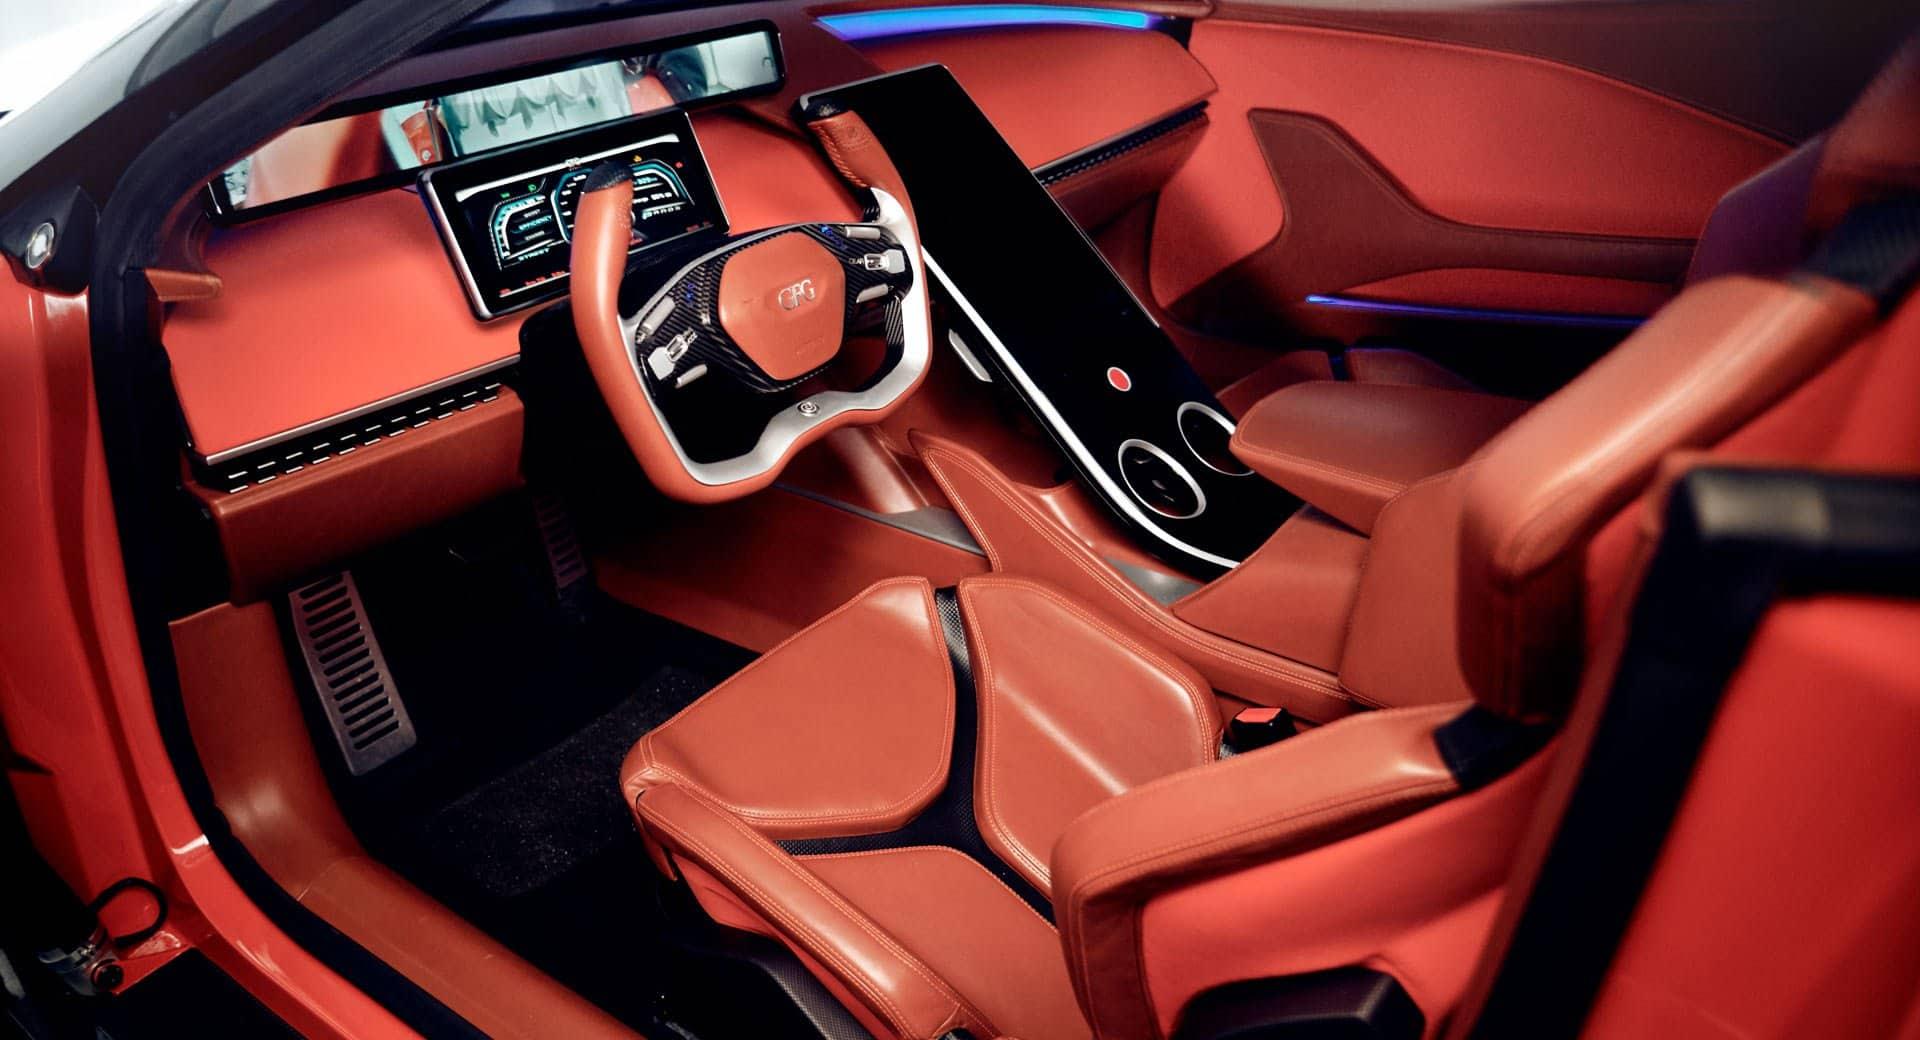 Gfg ستايل كانجارو سيارة كروس أوفر كهربائية خارقة بقوة 483 حصان في جنيف السيارات الموقع العربي الأول للسيارات